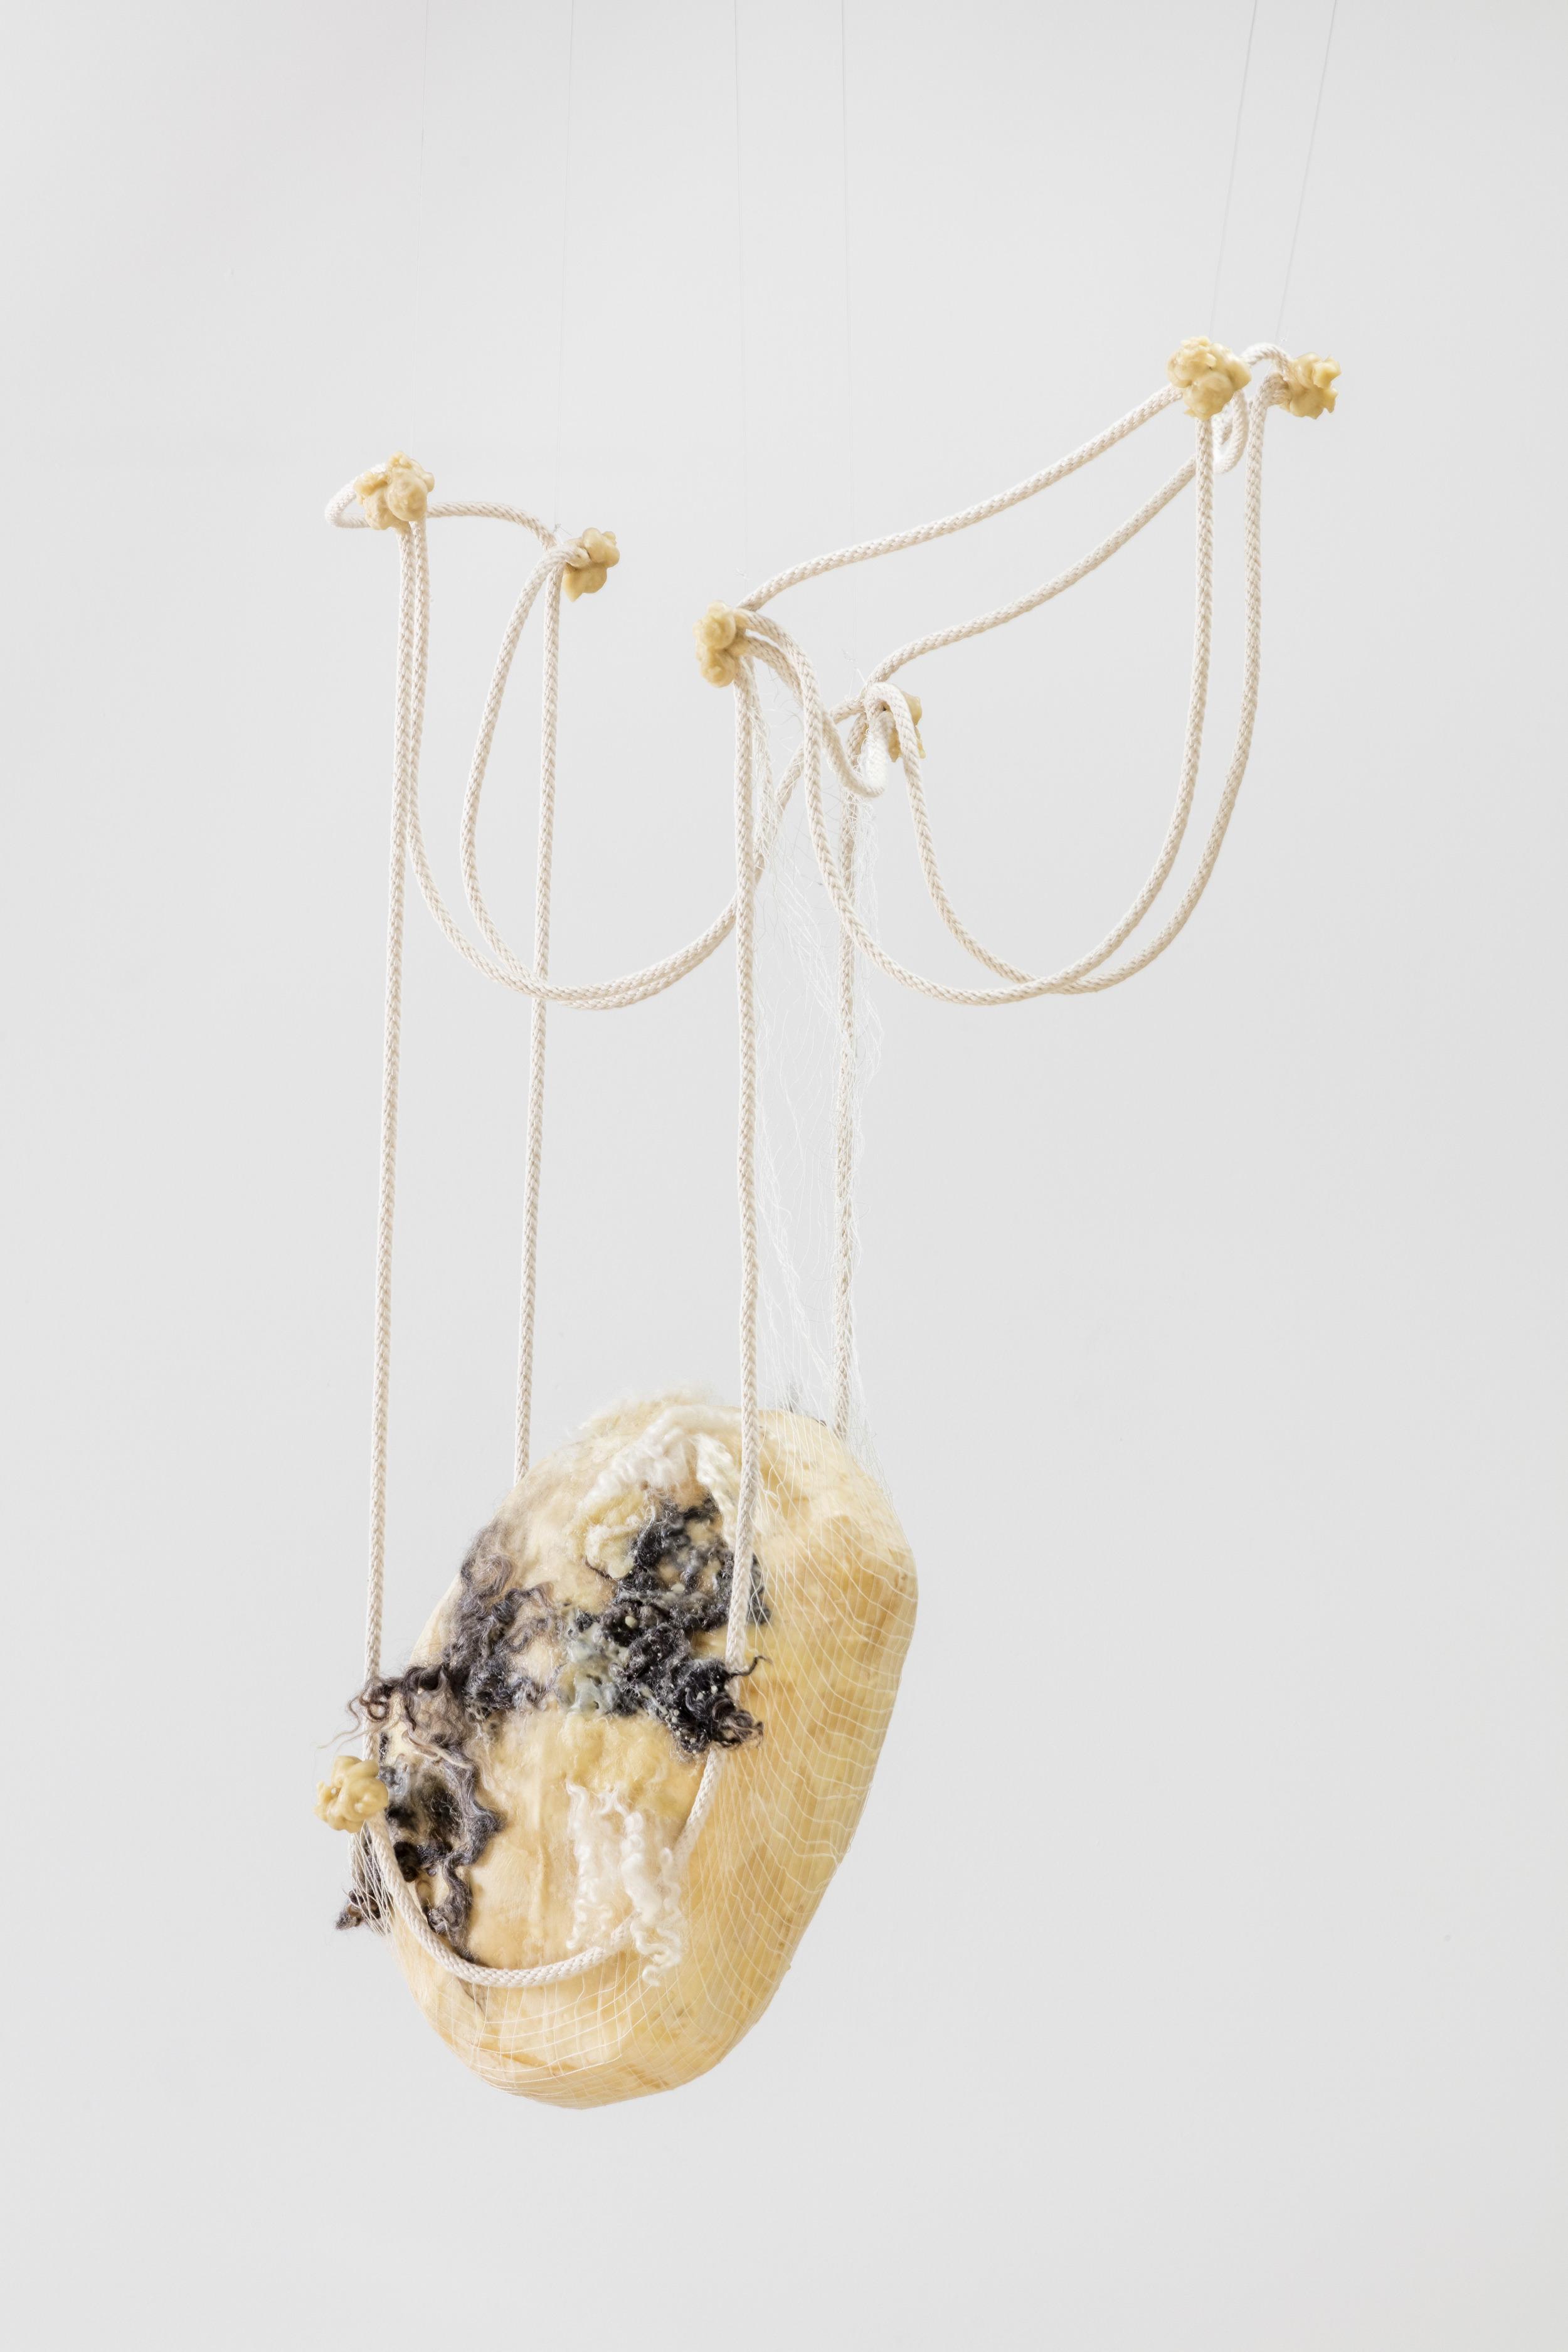 Tanya Aguiniga   Privilege , 2016  Cotton rope, cotton thread, foam, gauze, alpaca, wool and beeswax  33 x 18 x 9.5 inches